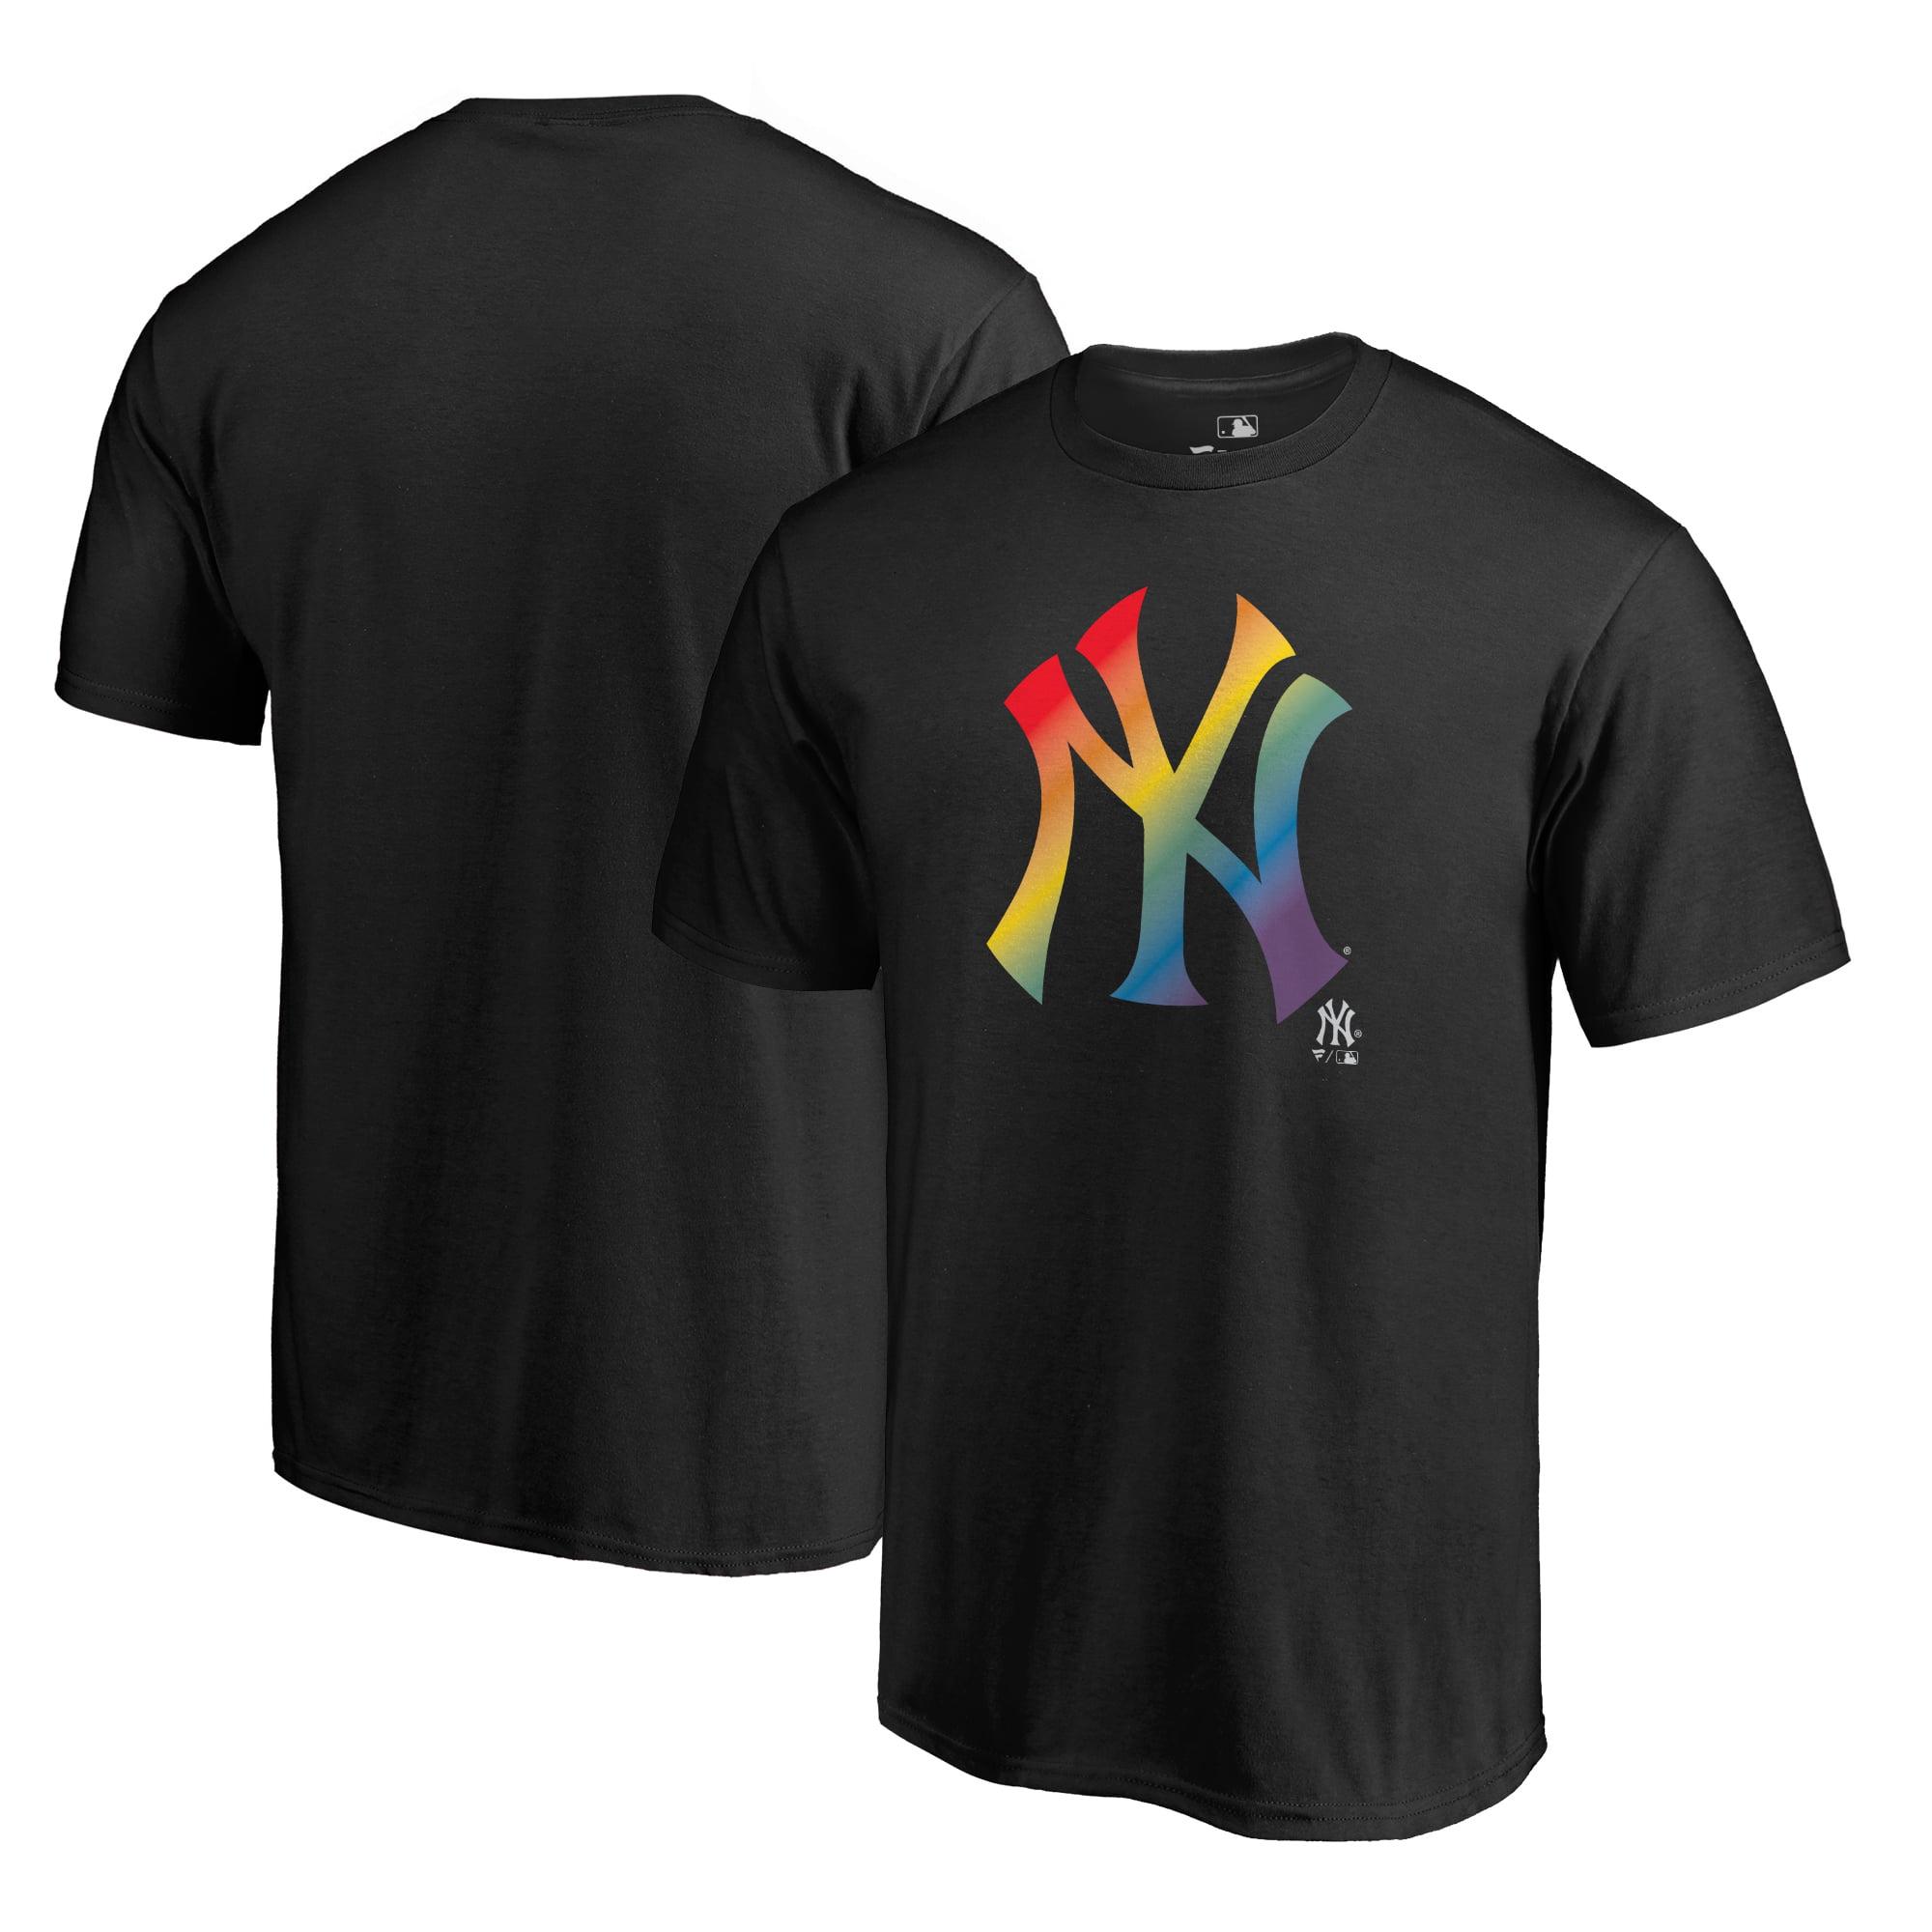 New York Yankees Fanatics Branded Big & Tall Pride T-Shirt - Black